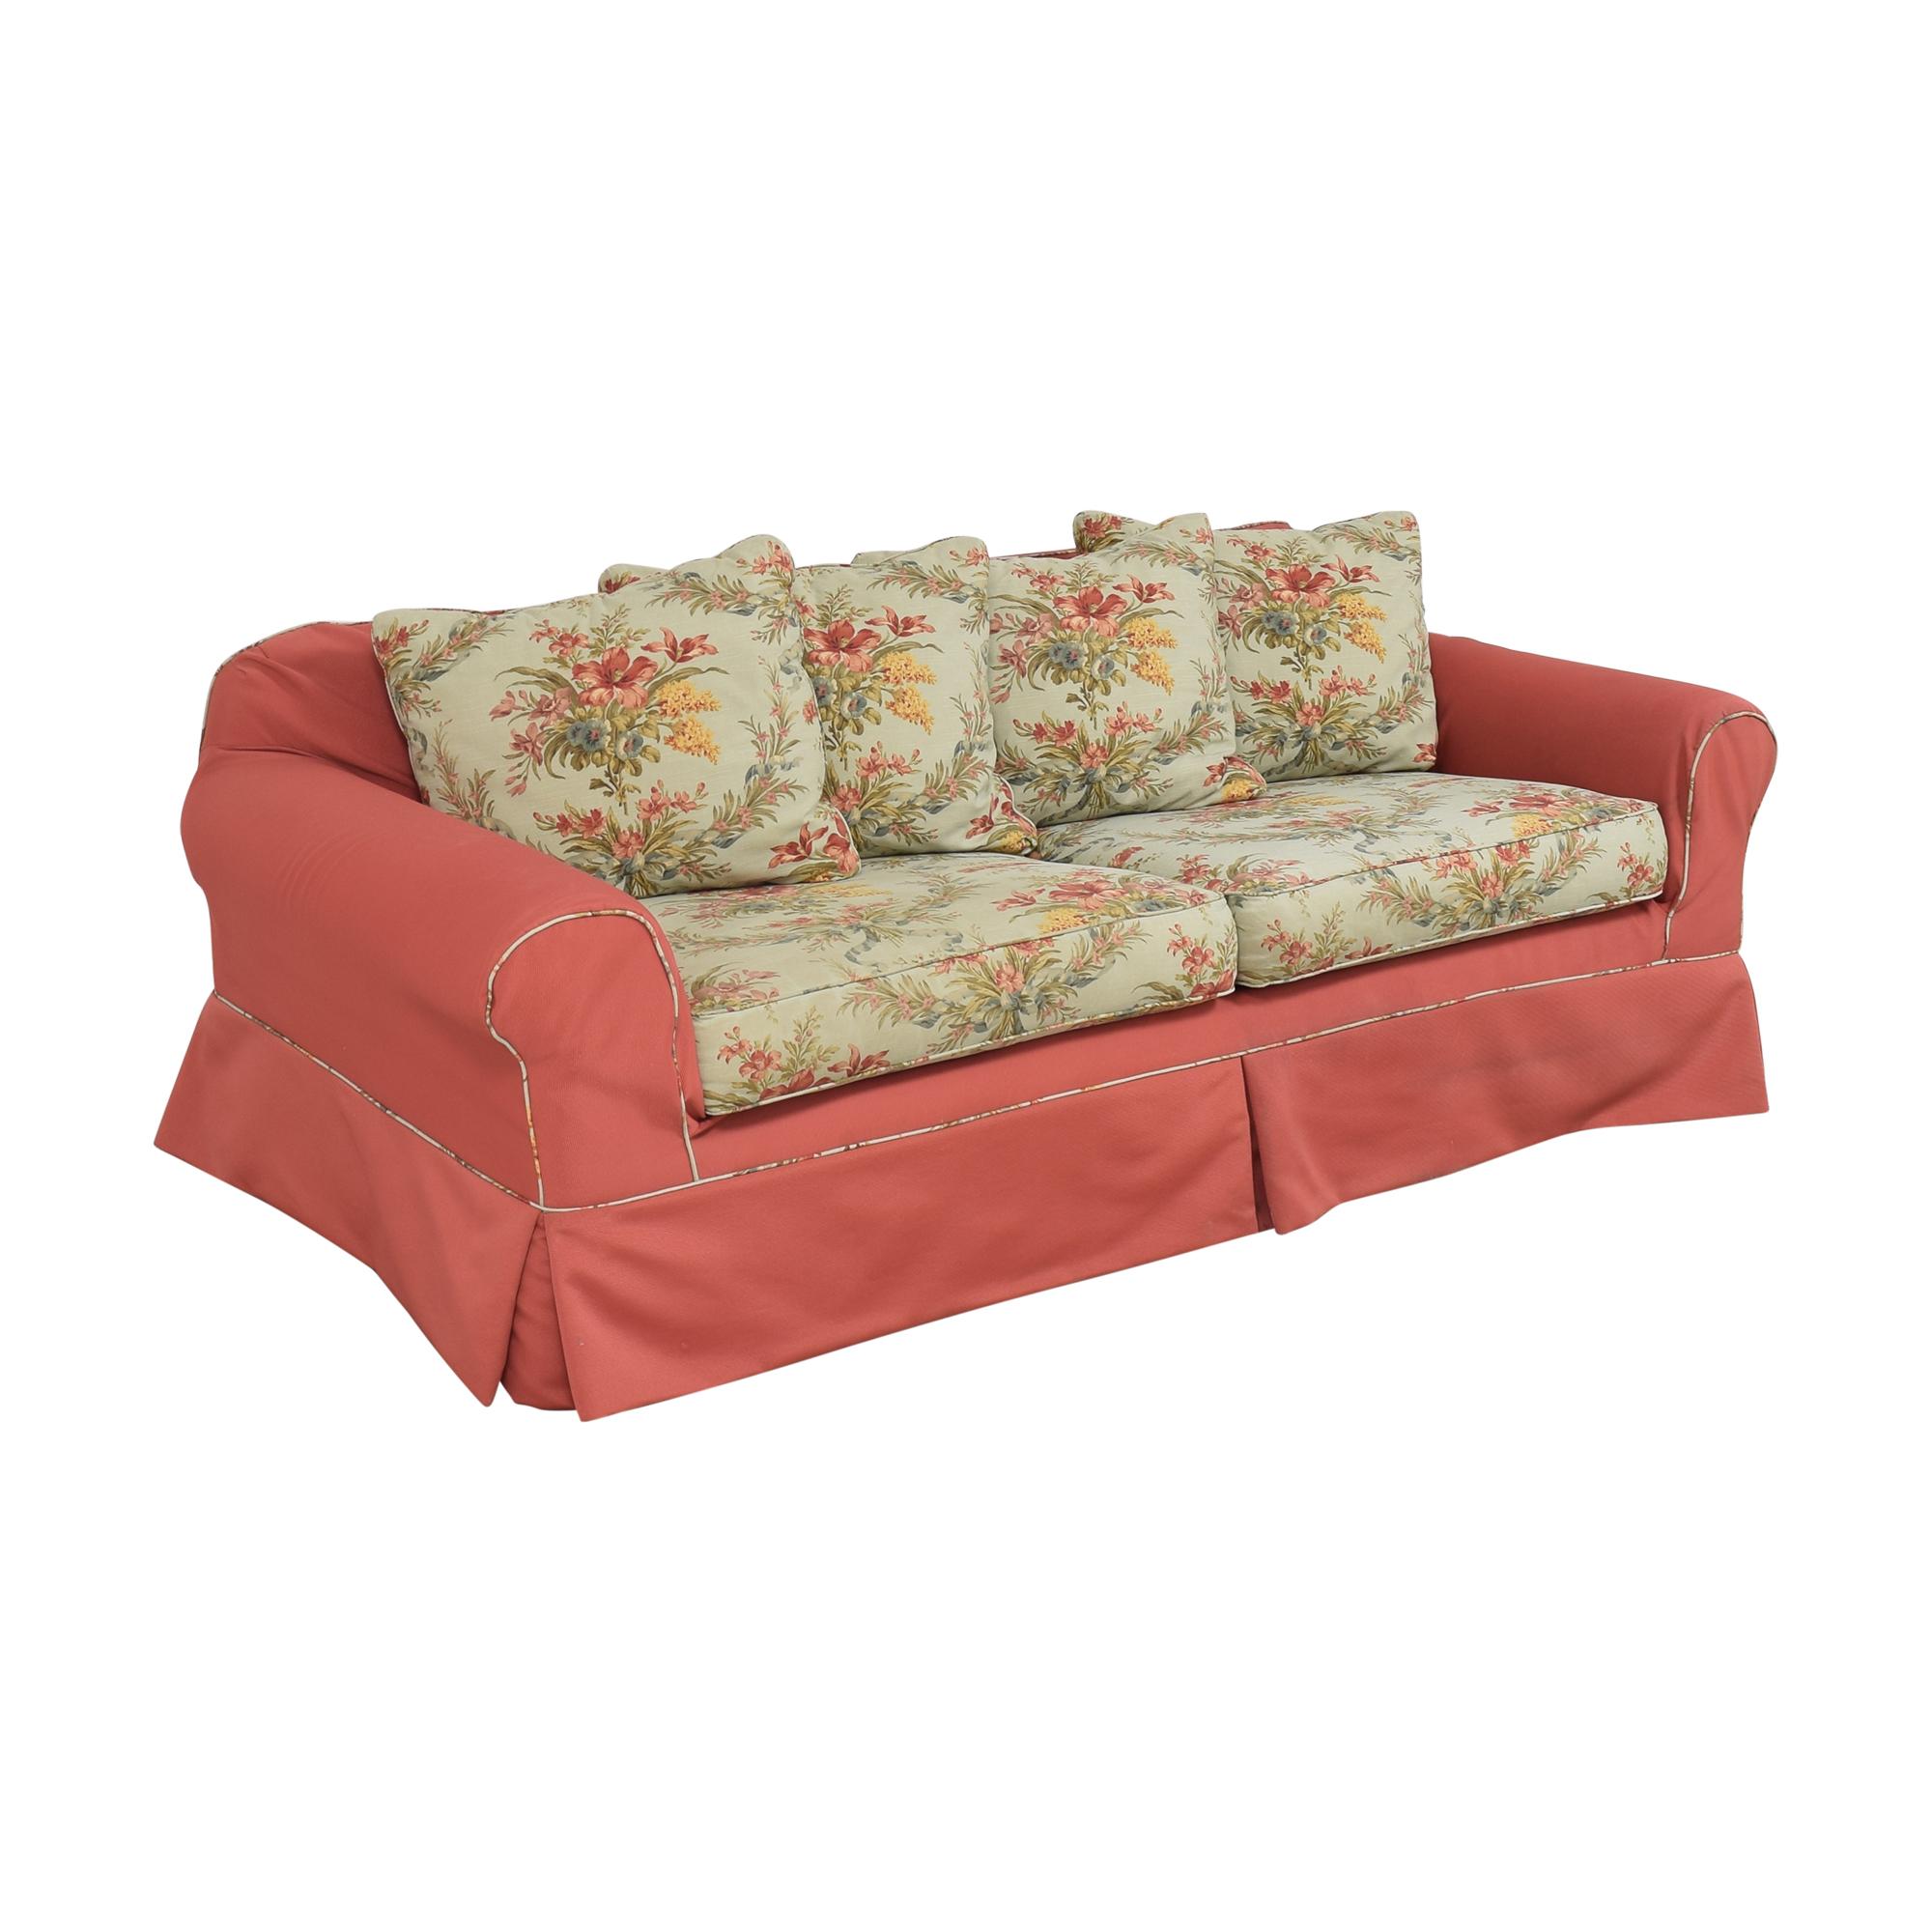 Ethan Allen Slipcovered Sofa Ethan Allen